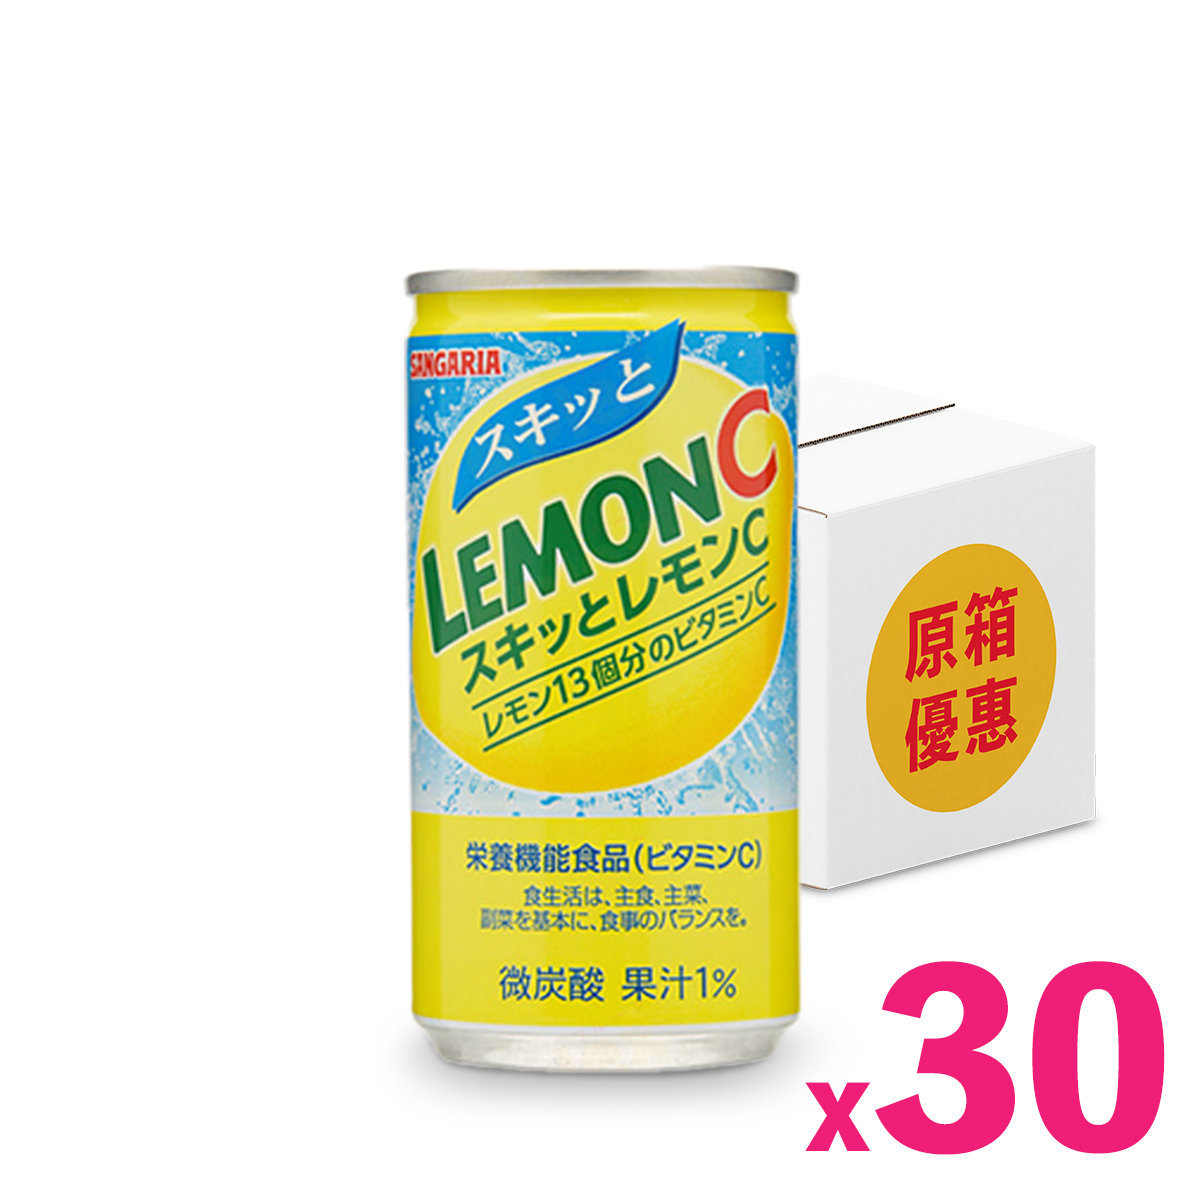 Japan Vitamin C Tonic Lemon Water (190ml) x 30